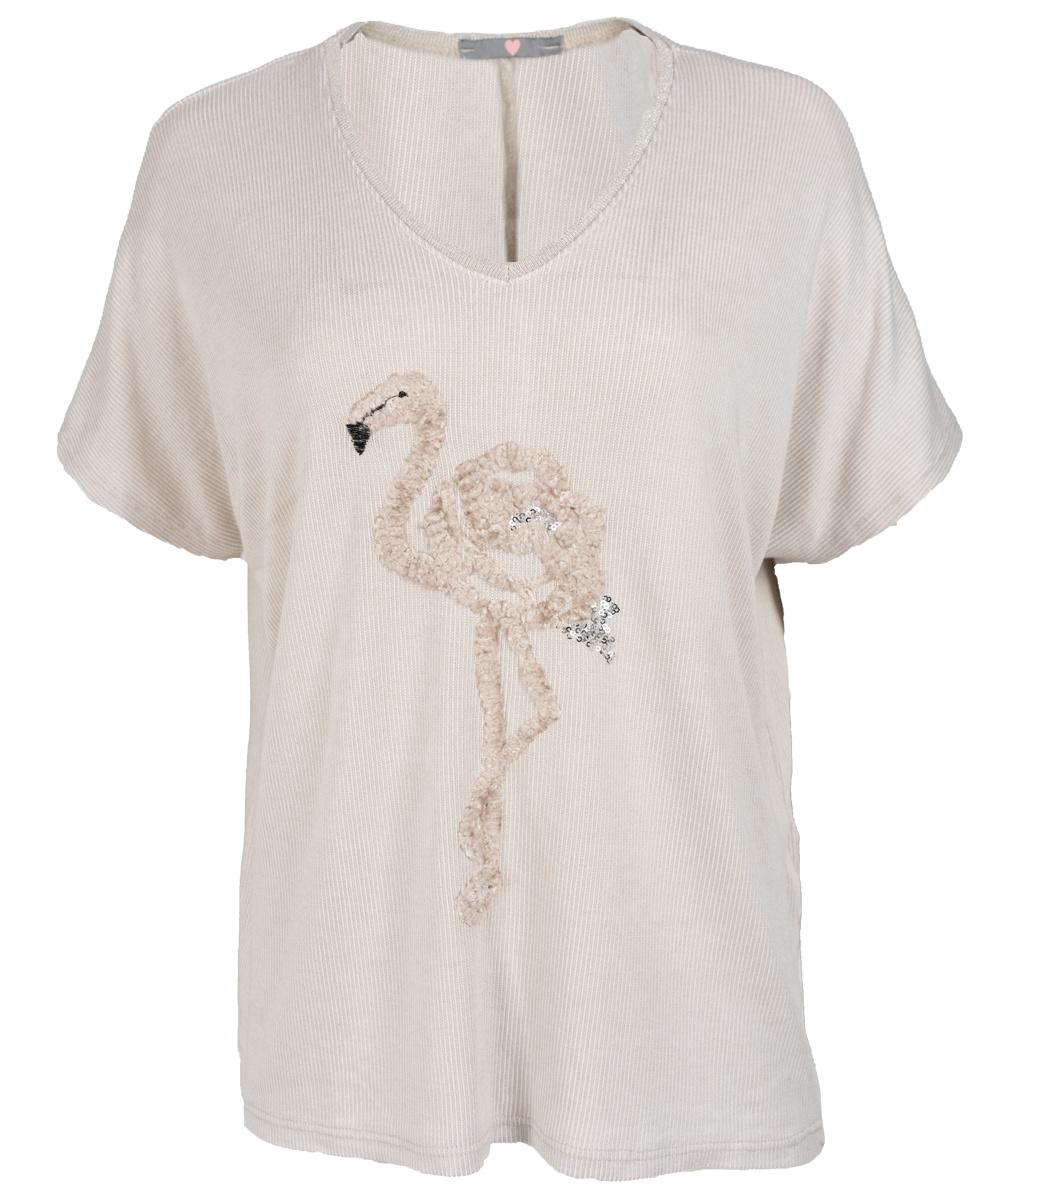 Wannahavesfashion Shirt beige flamingo